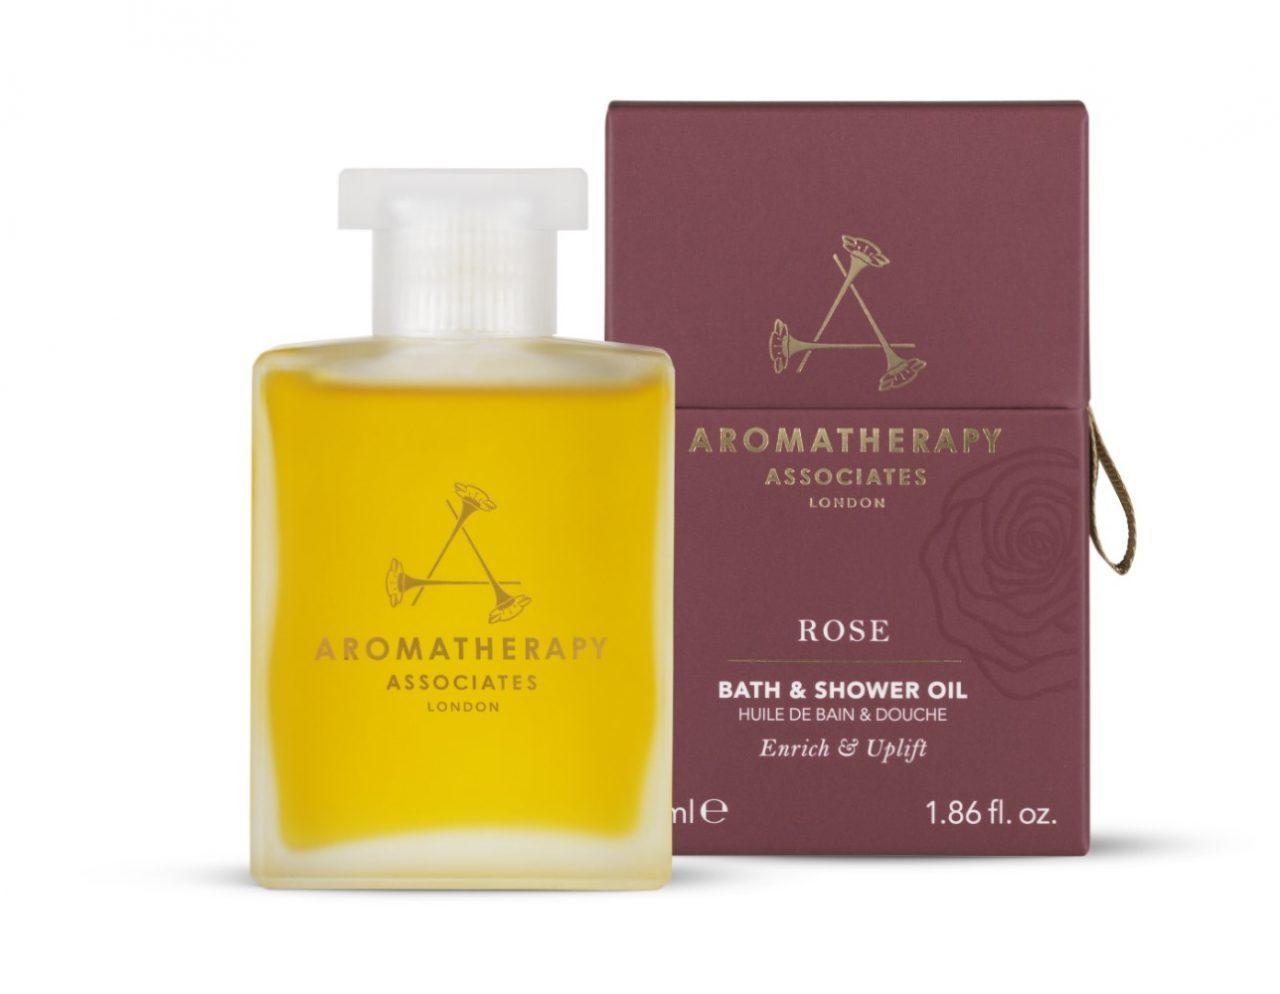 Aromatherapy Associates - Bath & Shower Oil